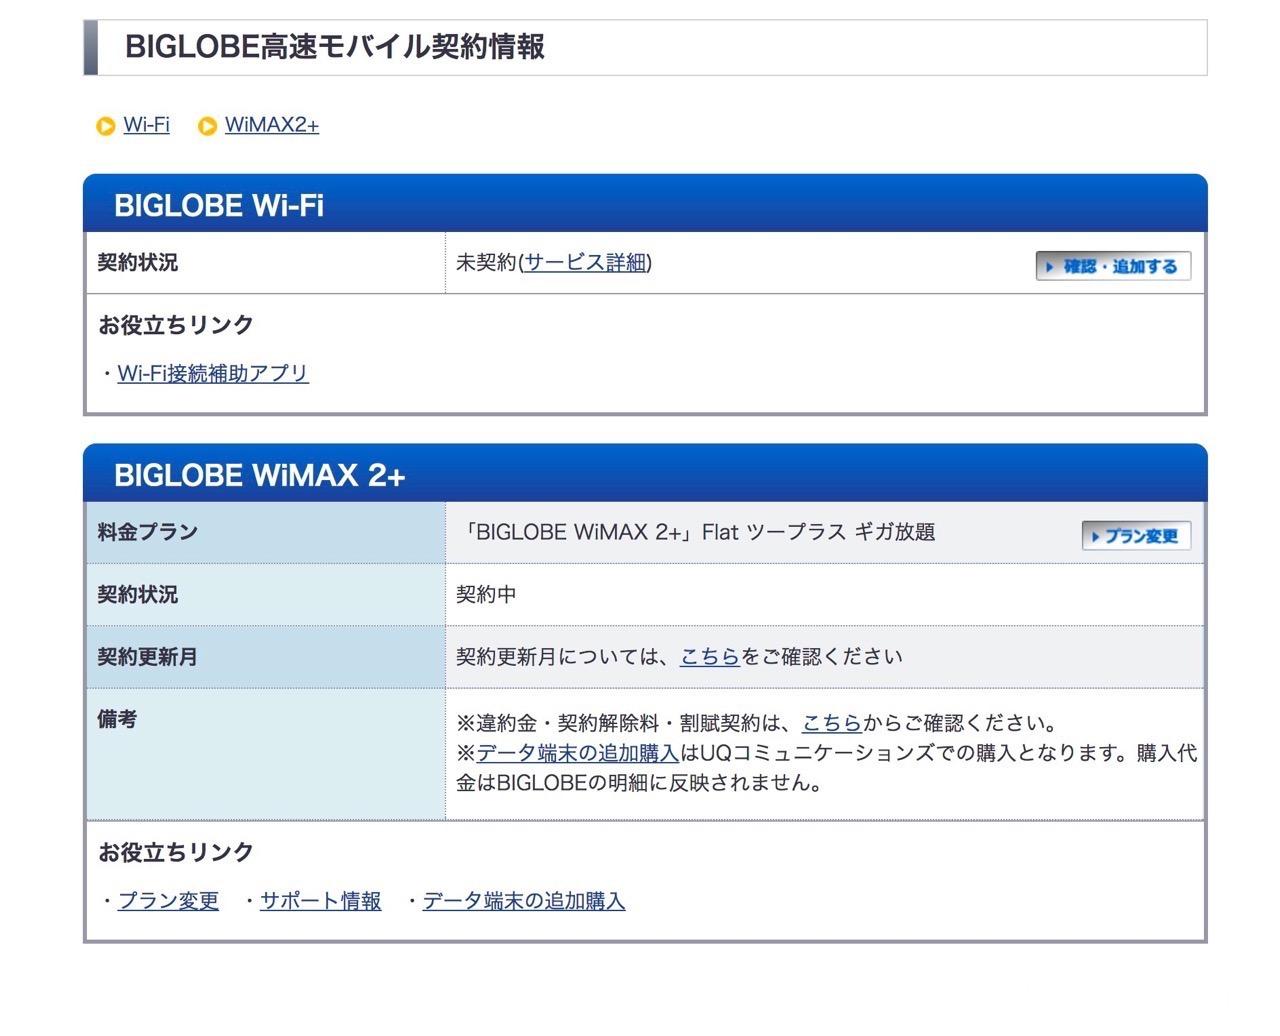 170410 biglobe wimax 6